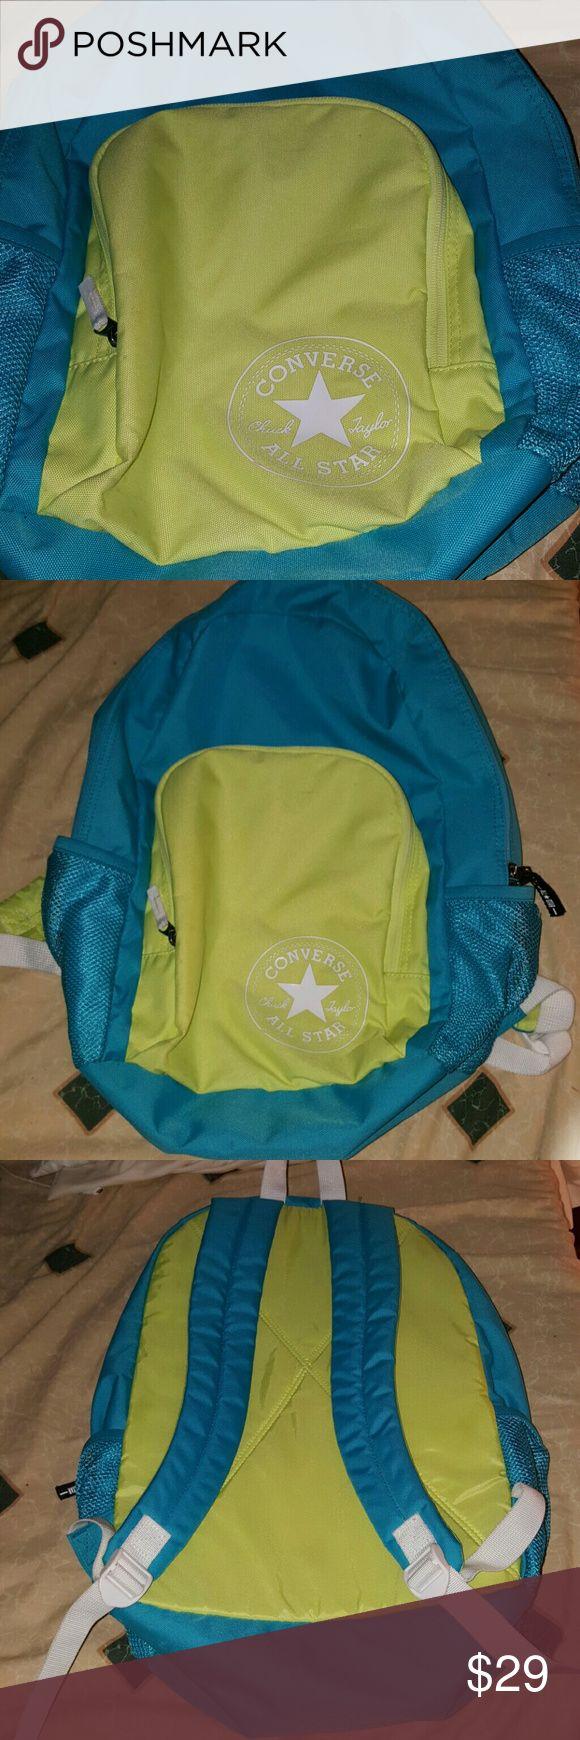 Converse All Star backpack bookbag EUC Converse All Star backpack bookbag turquoise blue with bright yellow Converse Bags Backpacks